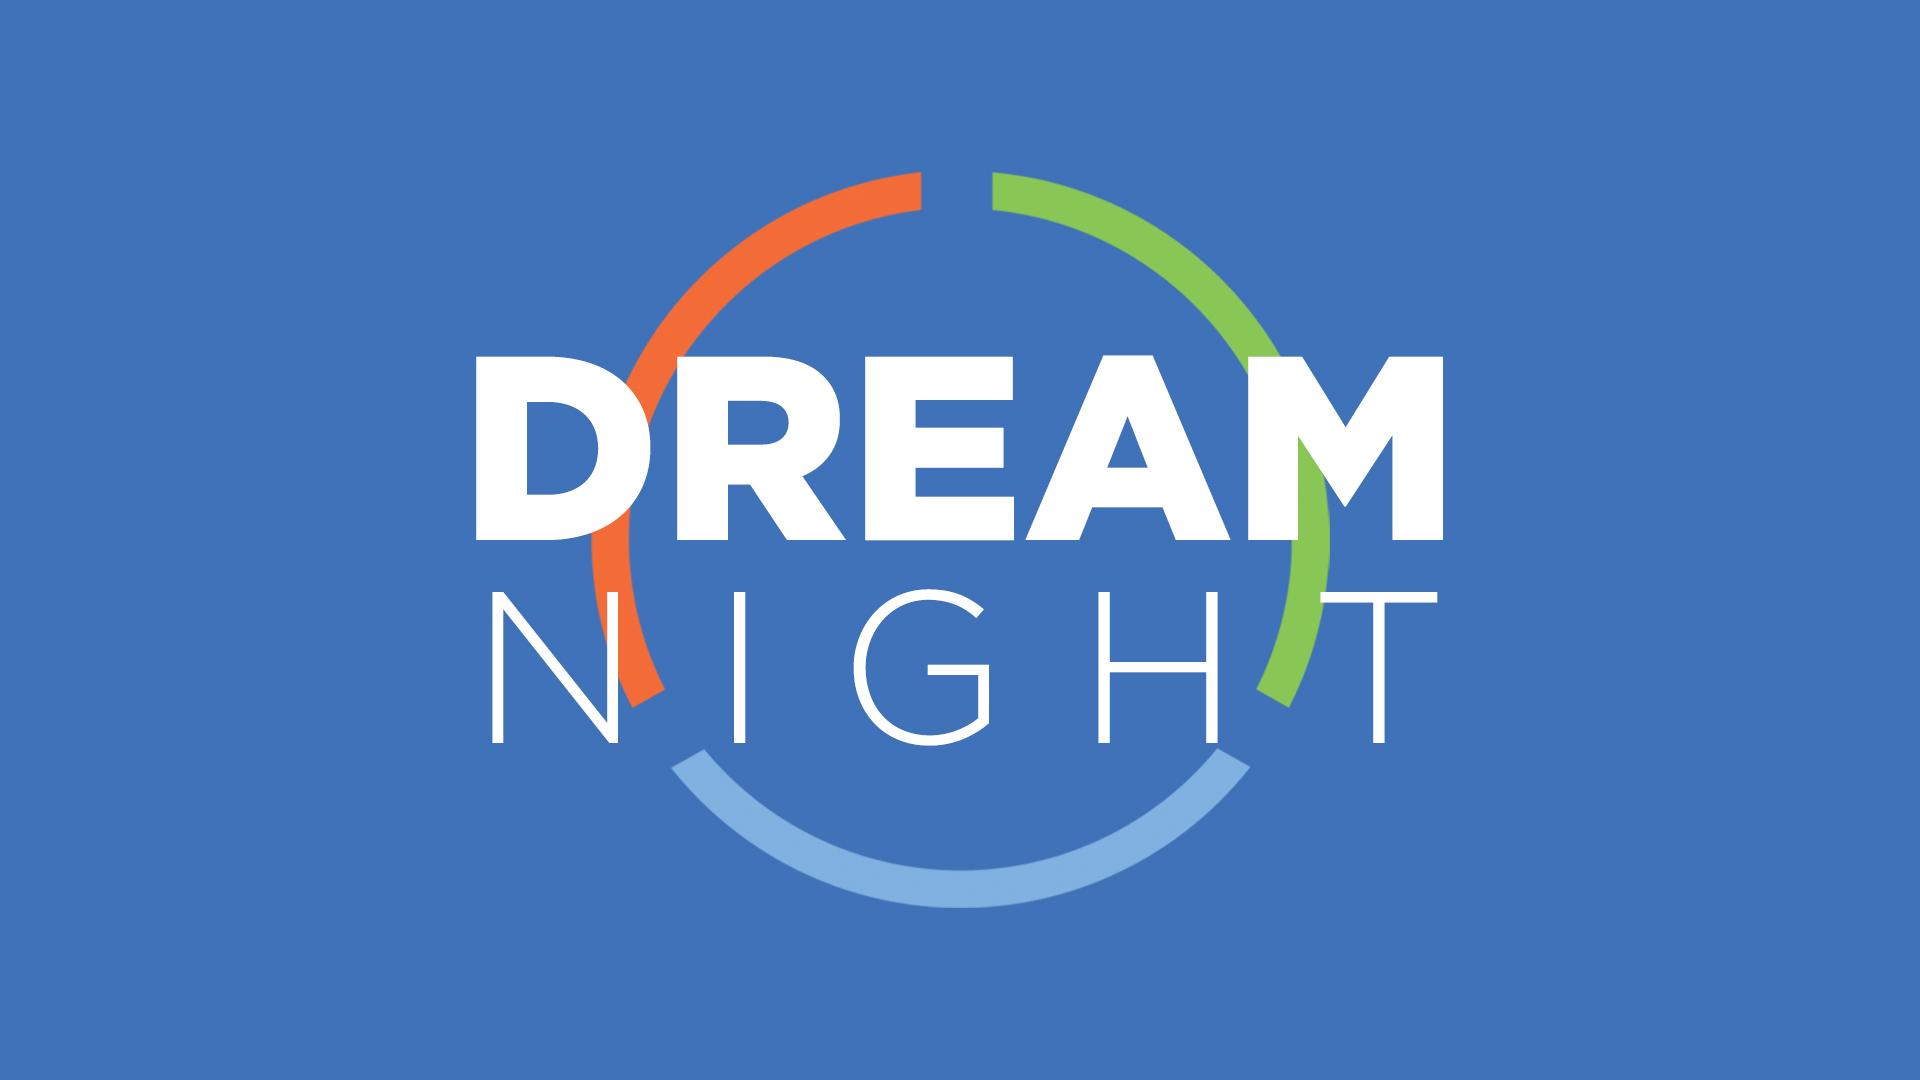 dream night (1).jpg